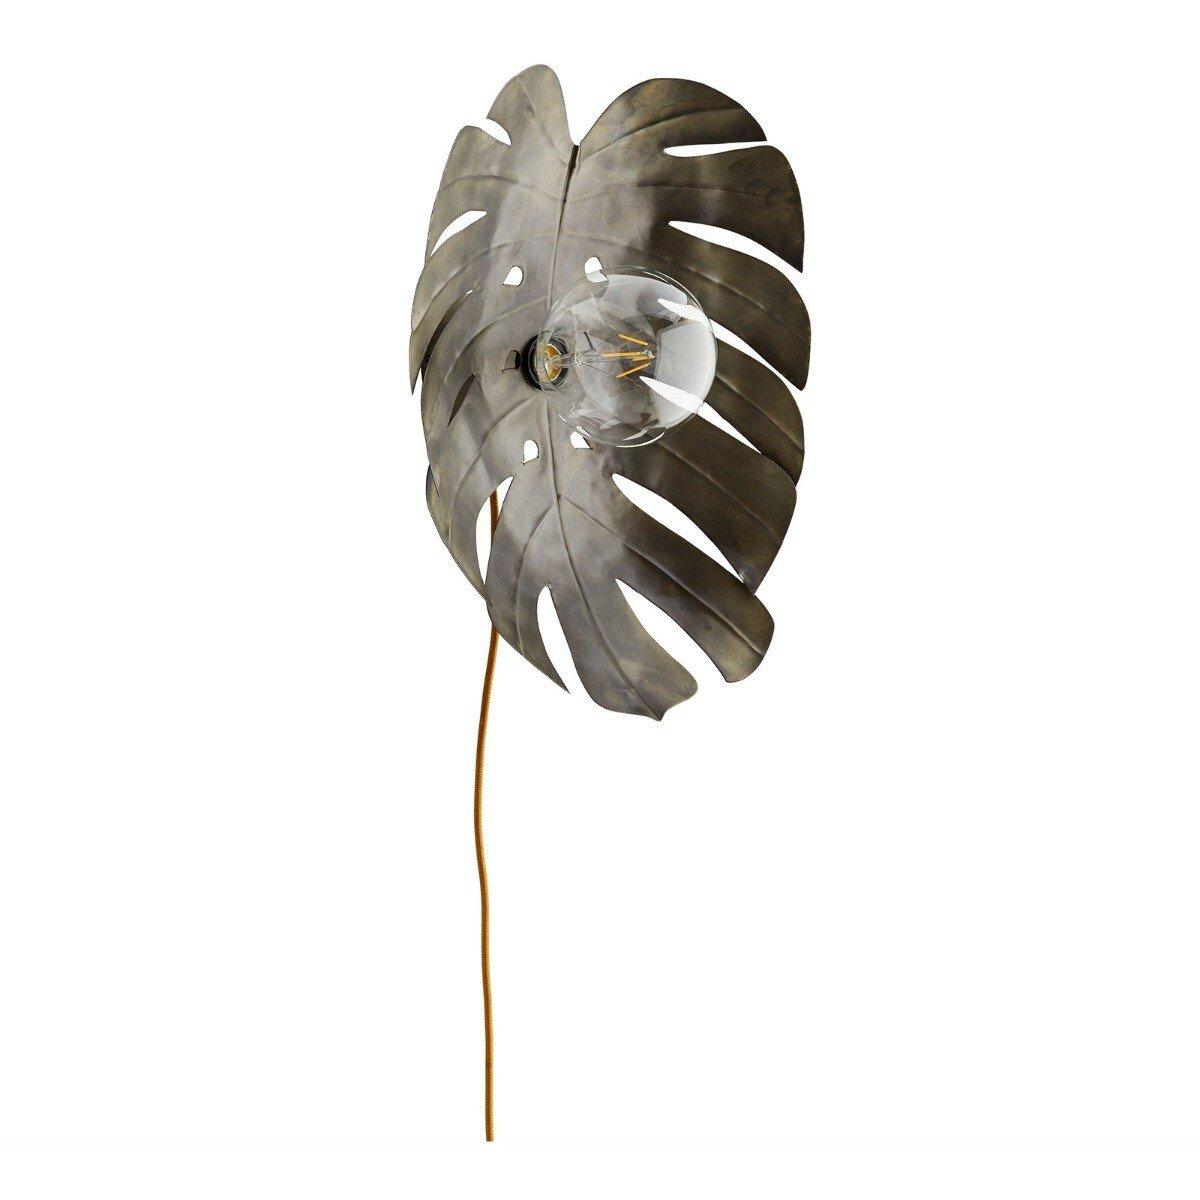 Madam Stoltz wandlamp blad aluminium ijzer 20 x 40 x 30